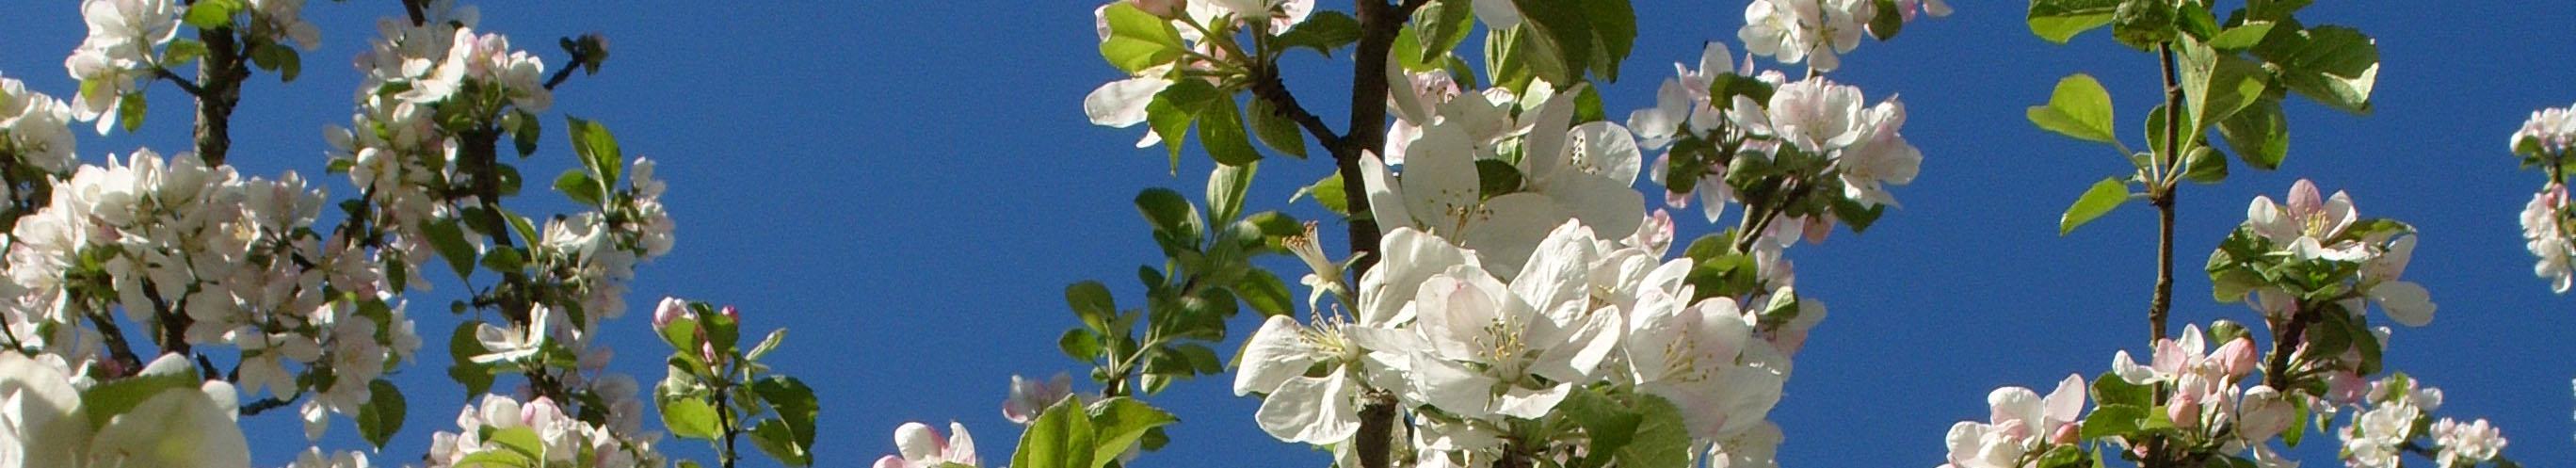 urshults äppelkungar